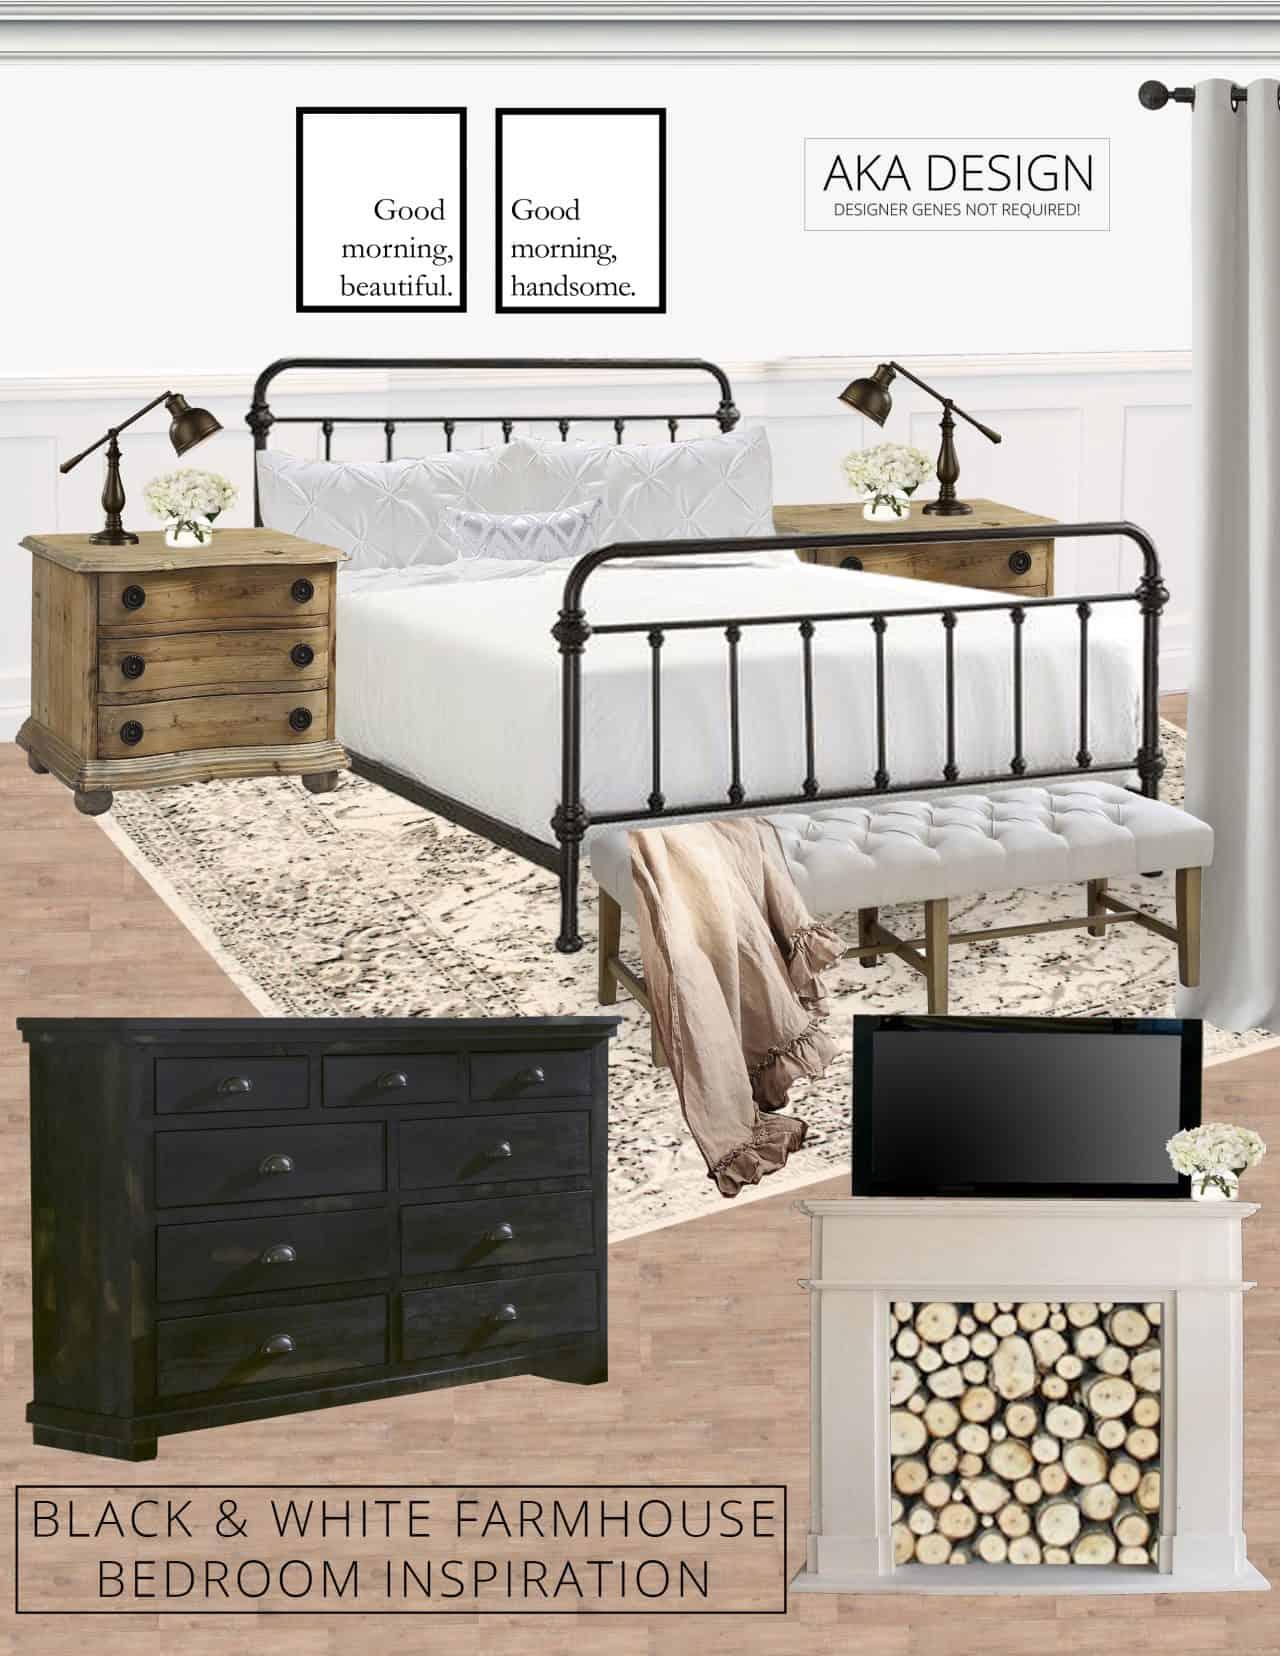 Good Black and White Farmhouse Bedroom Inspiration